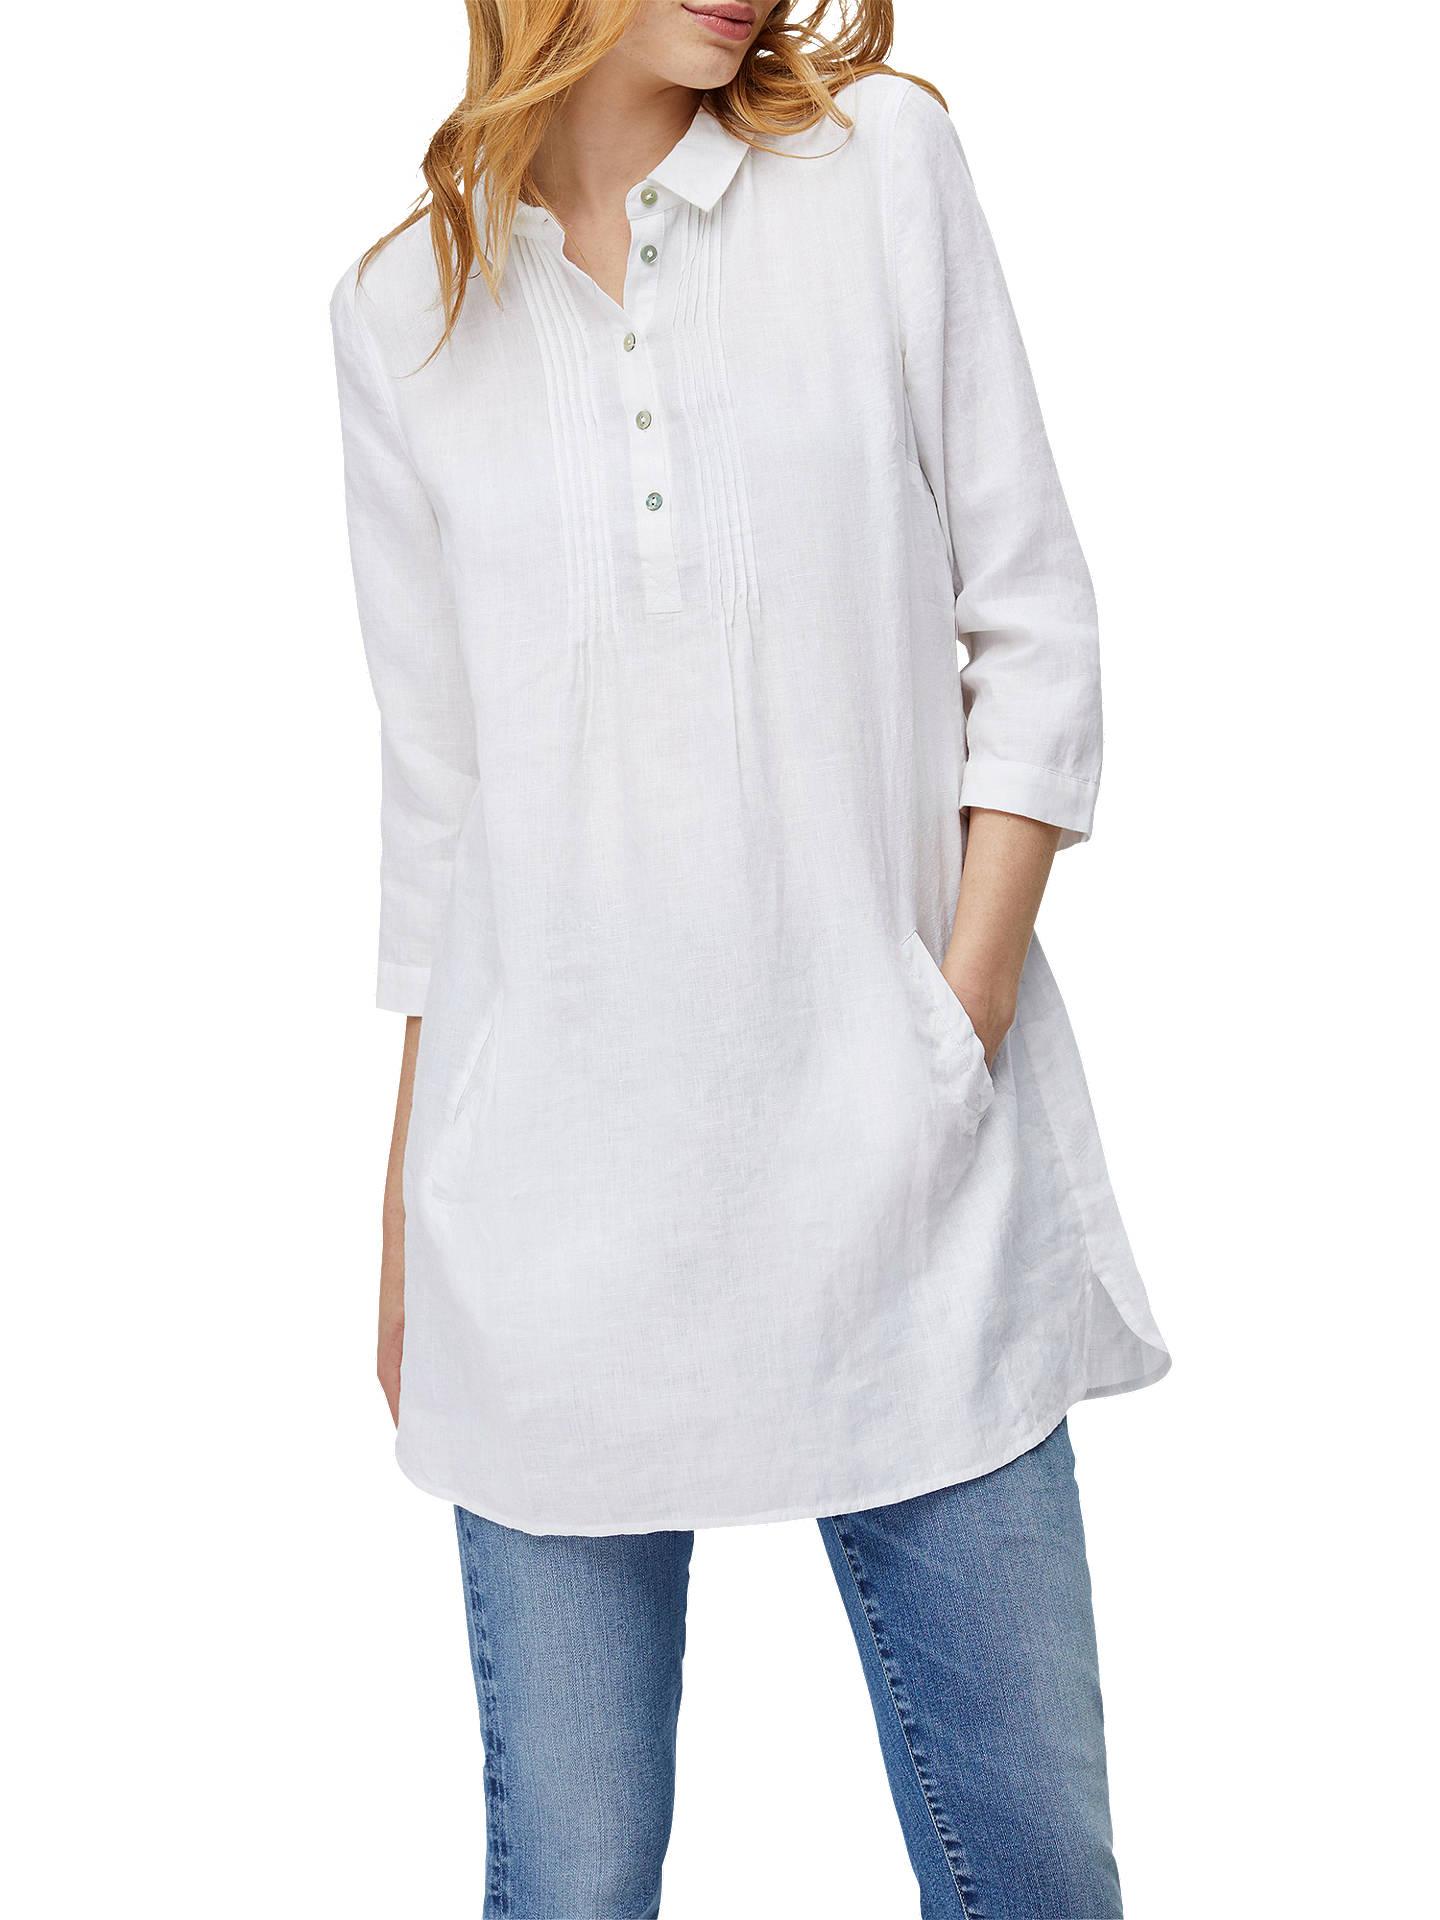 White Stuff Tessa Linen Tunic Top, White at John Lewis & Partners